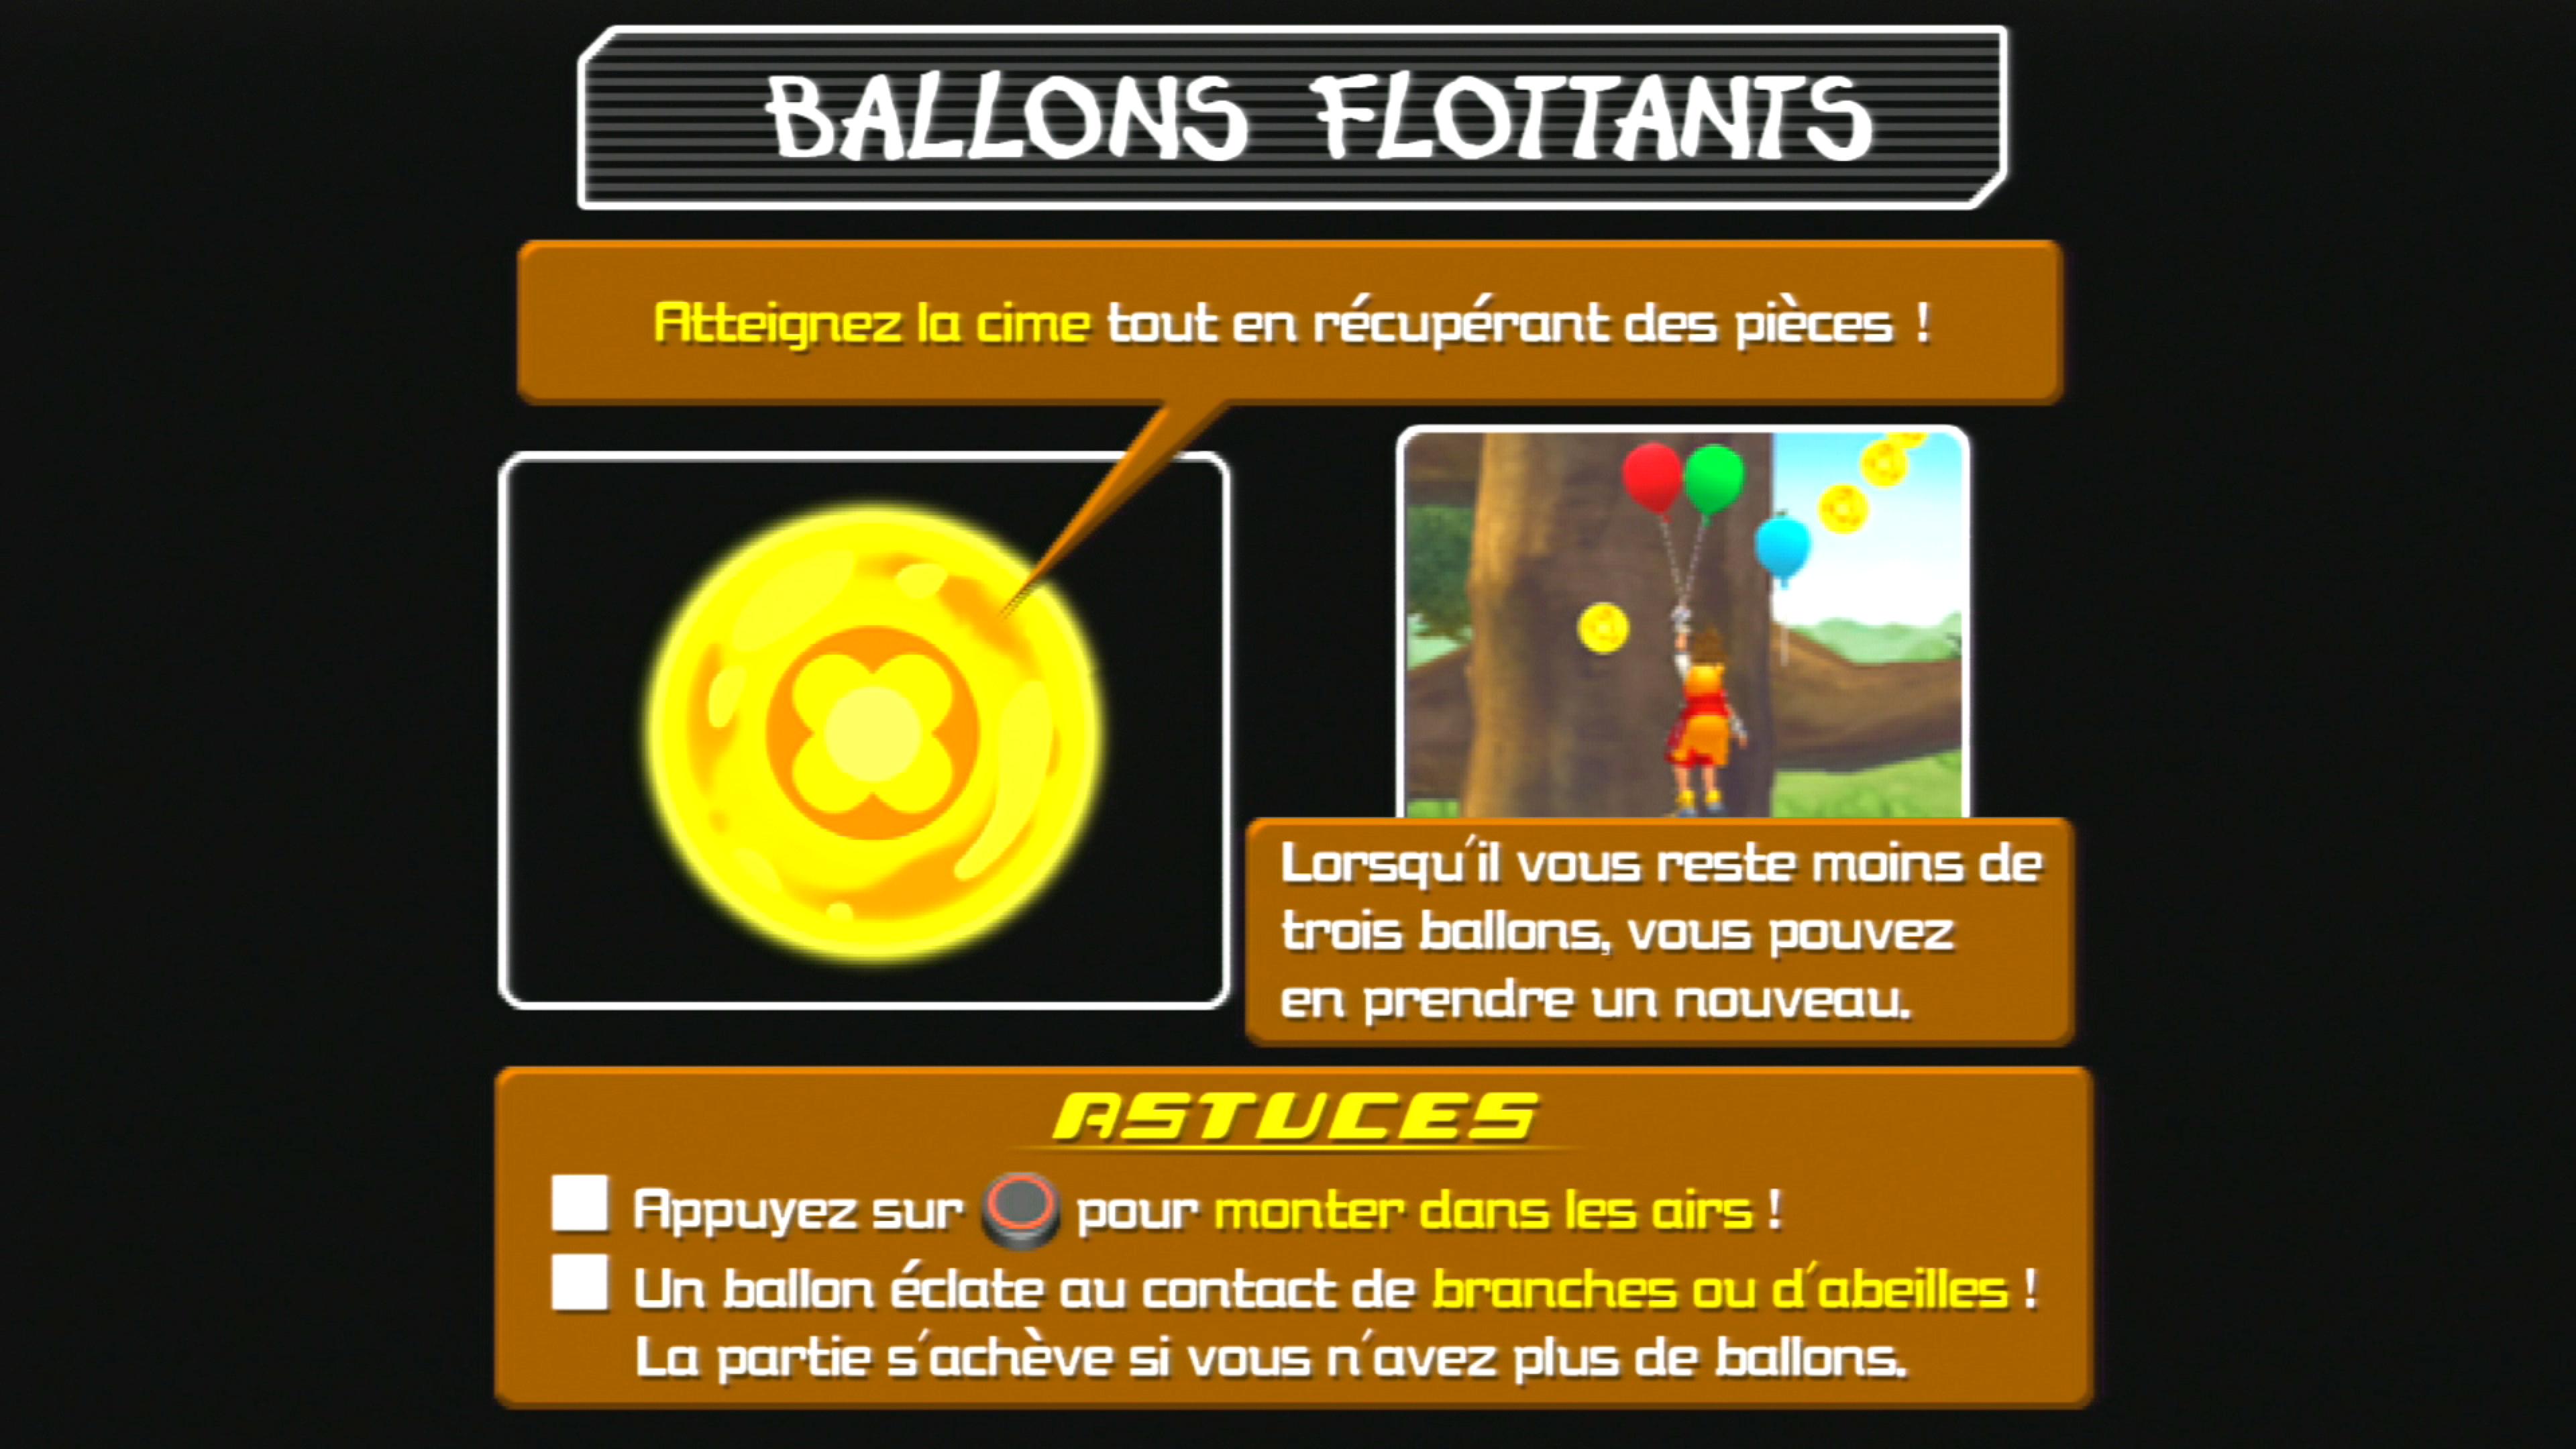 Ballons flottants